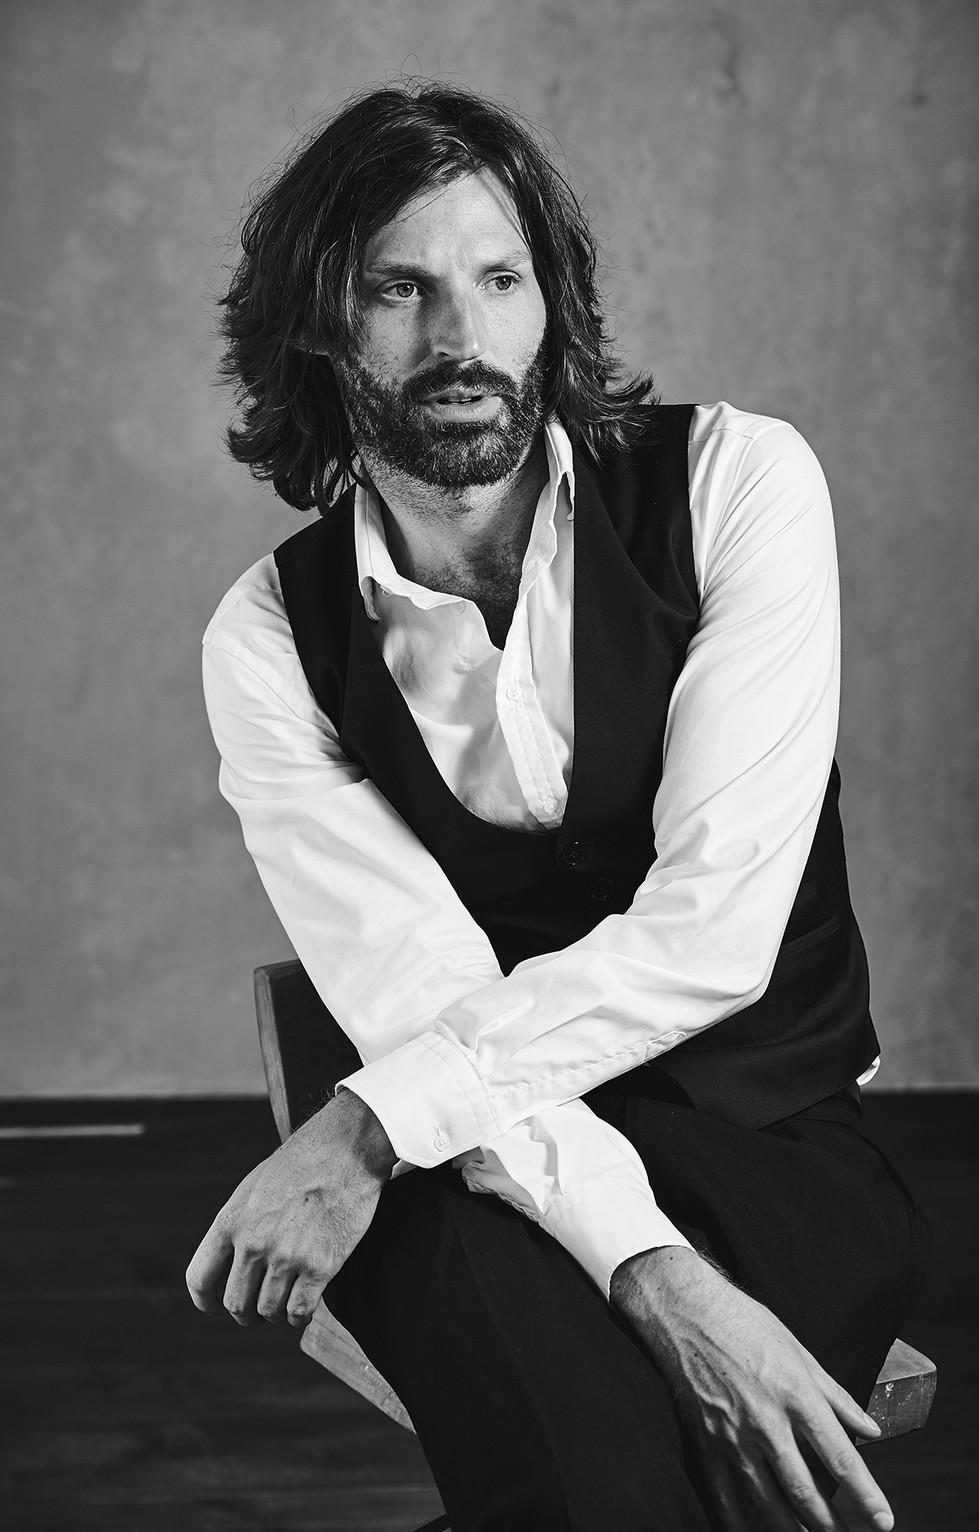 Model: Philip Krämer for stylecruze magazine